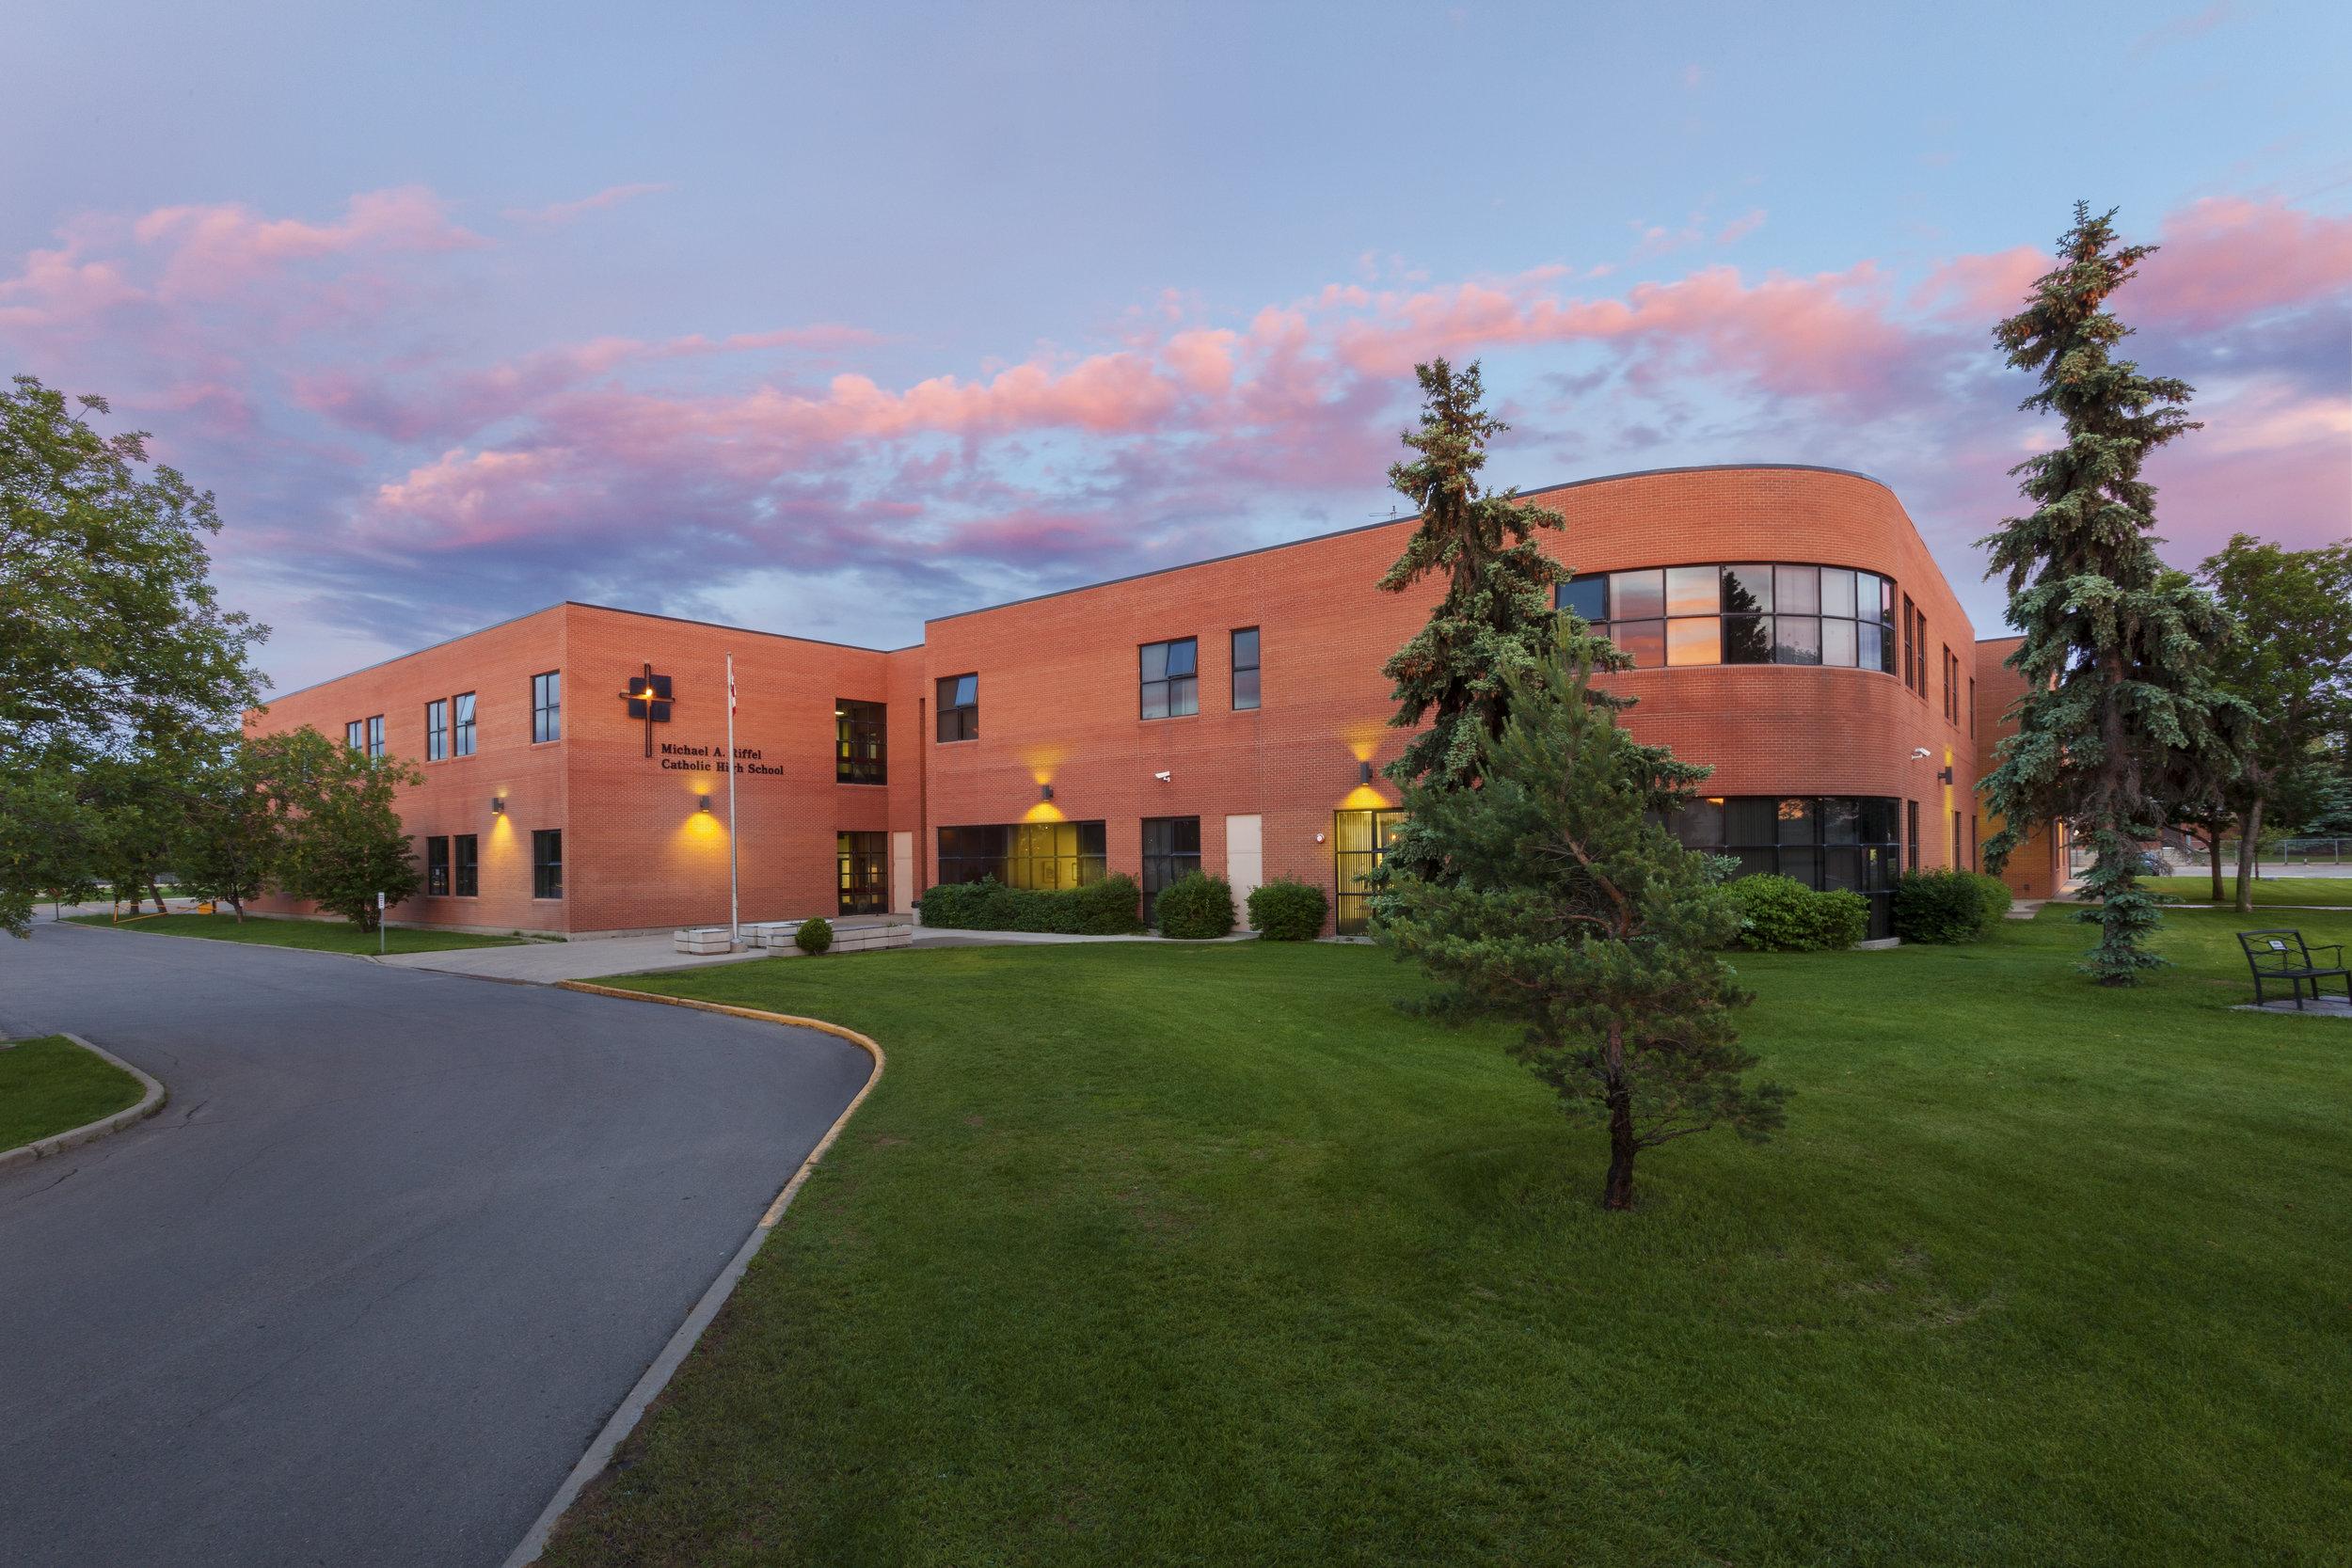 Michael A. Riffel Catholic Highschool - Regina, SK